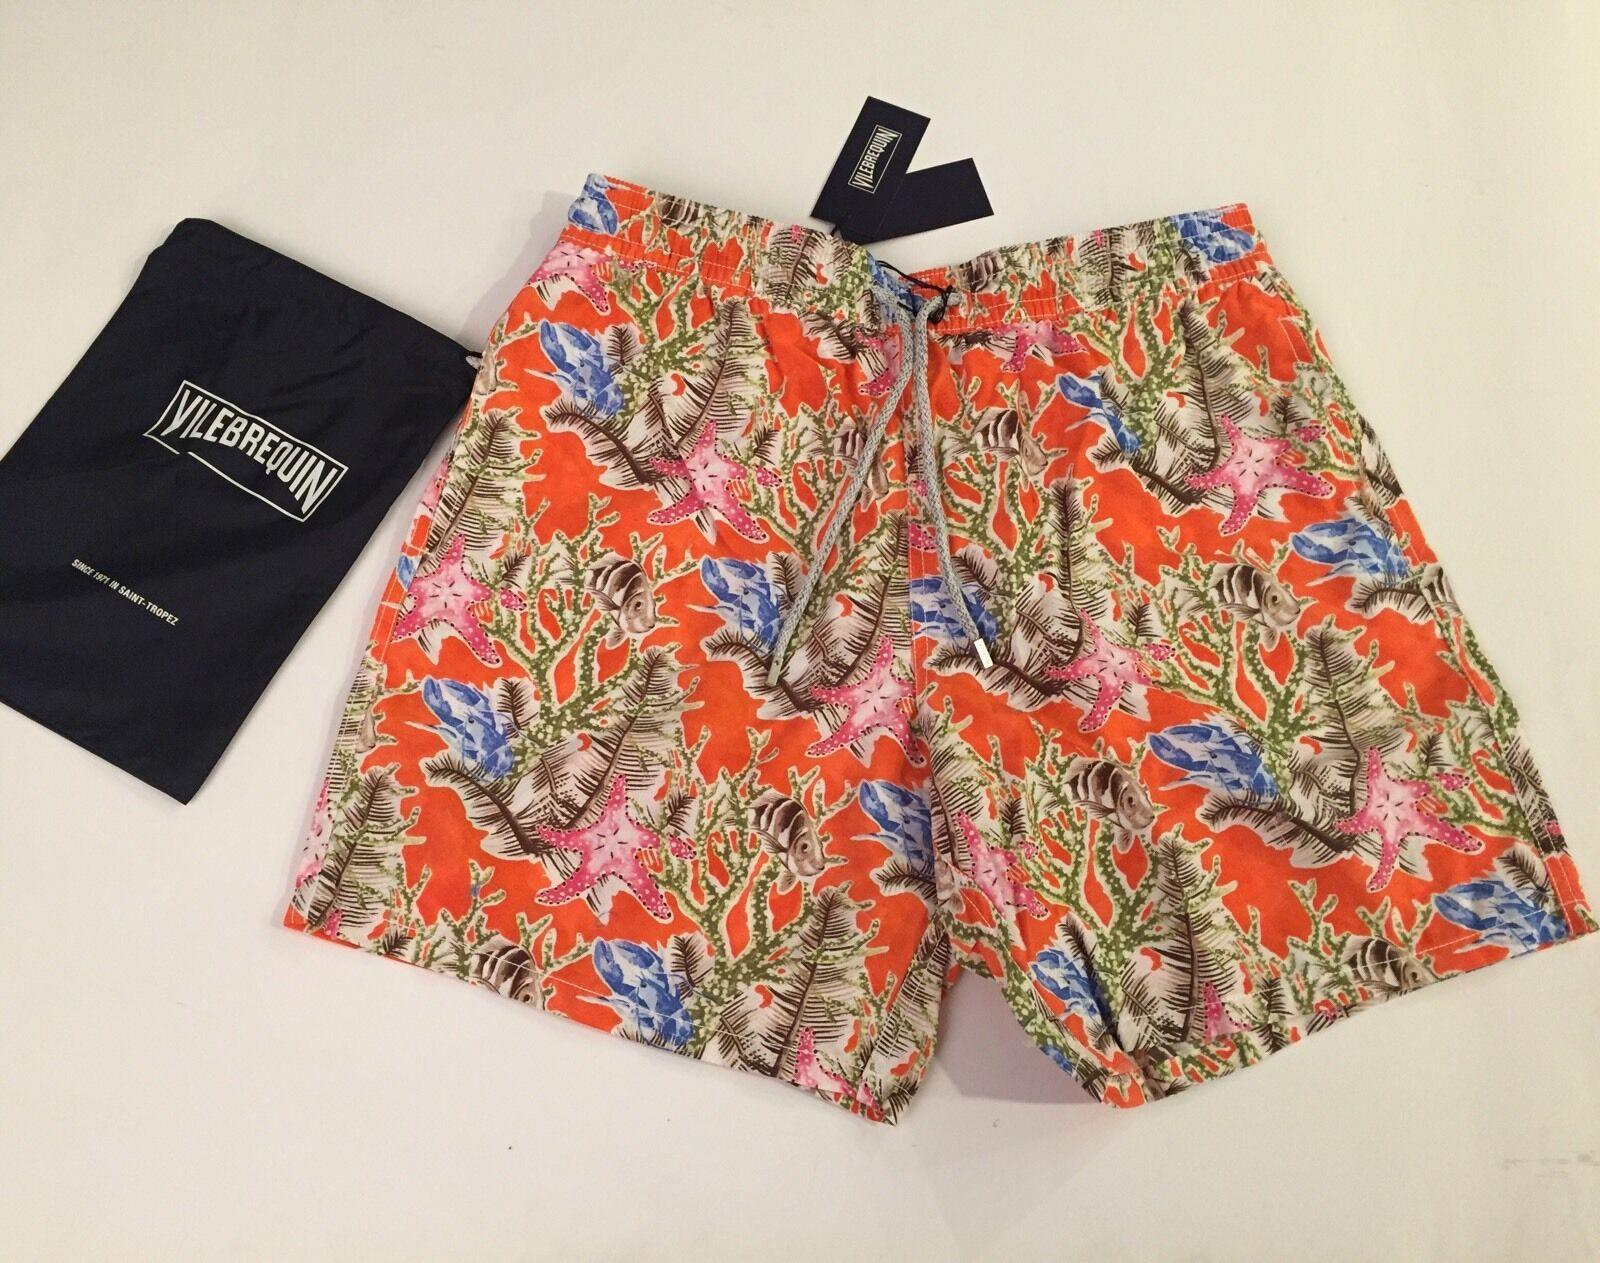 New w Tags & Bag Authentic Vilebrequin Moon Swim Trunks orange - Men Size 4XL